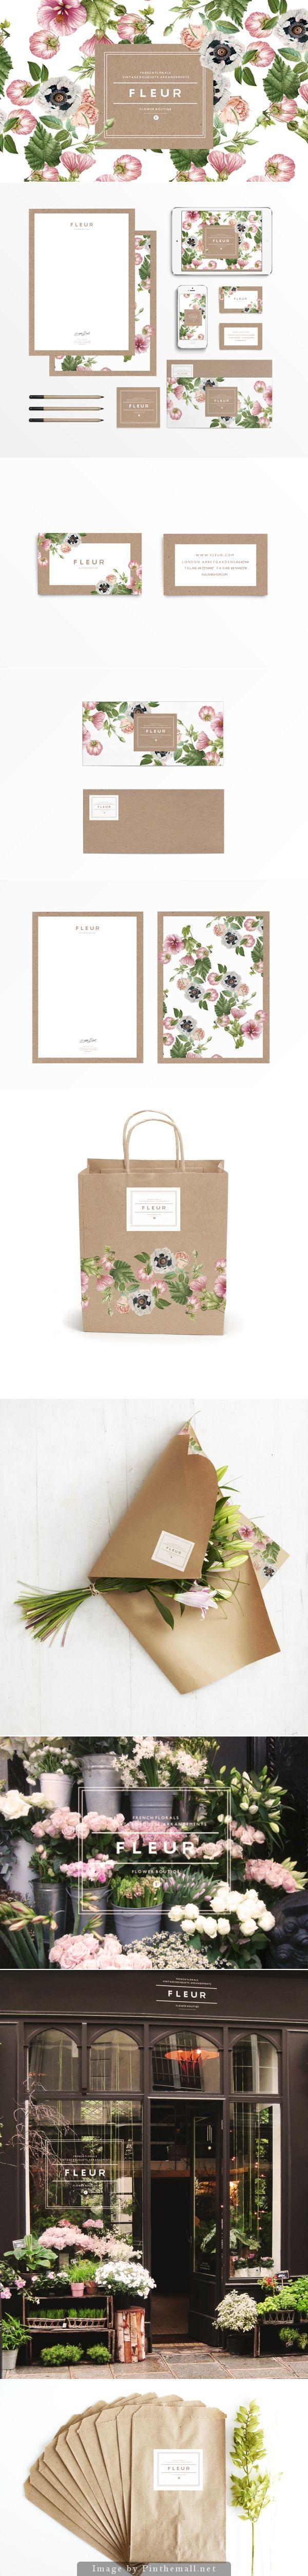 F L E U R flower shop branding designed by Judit Besze